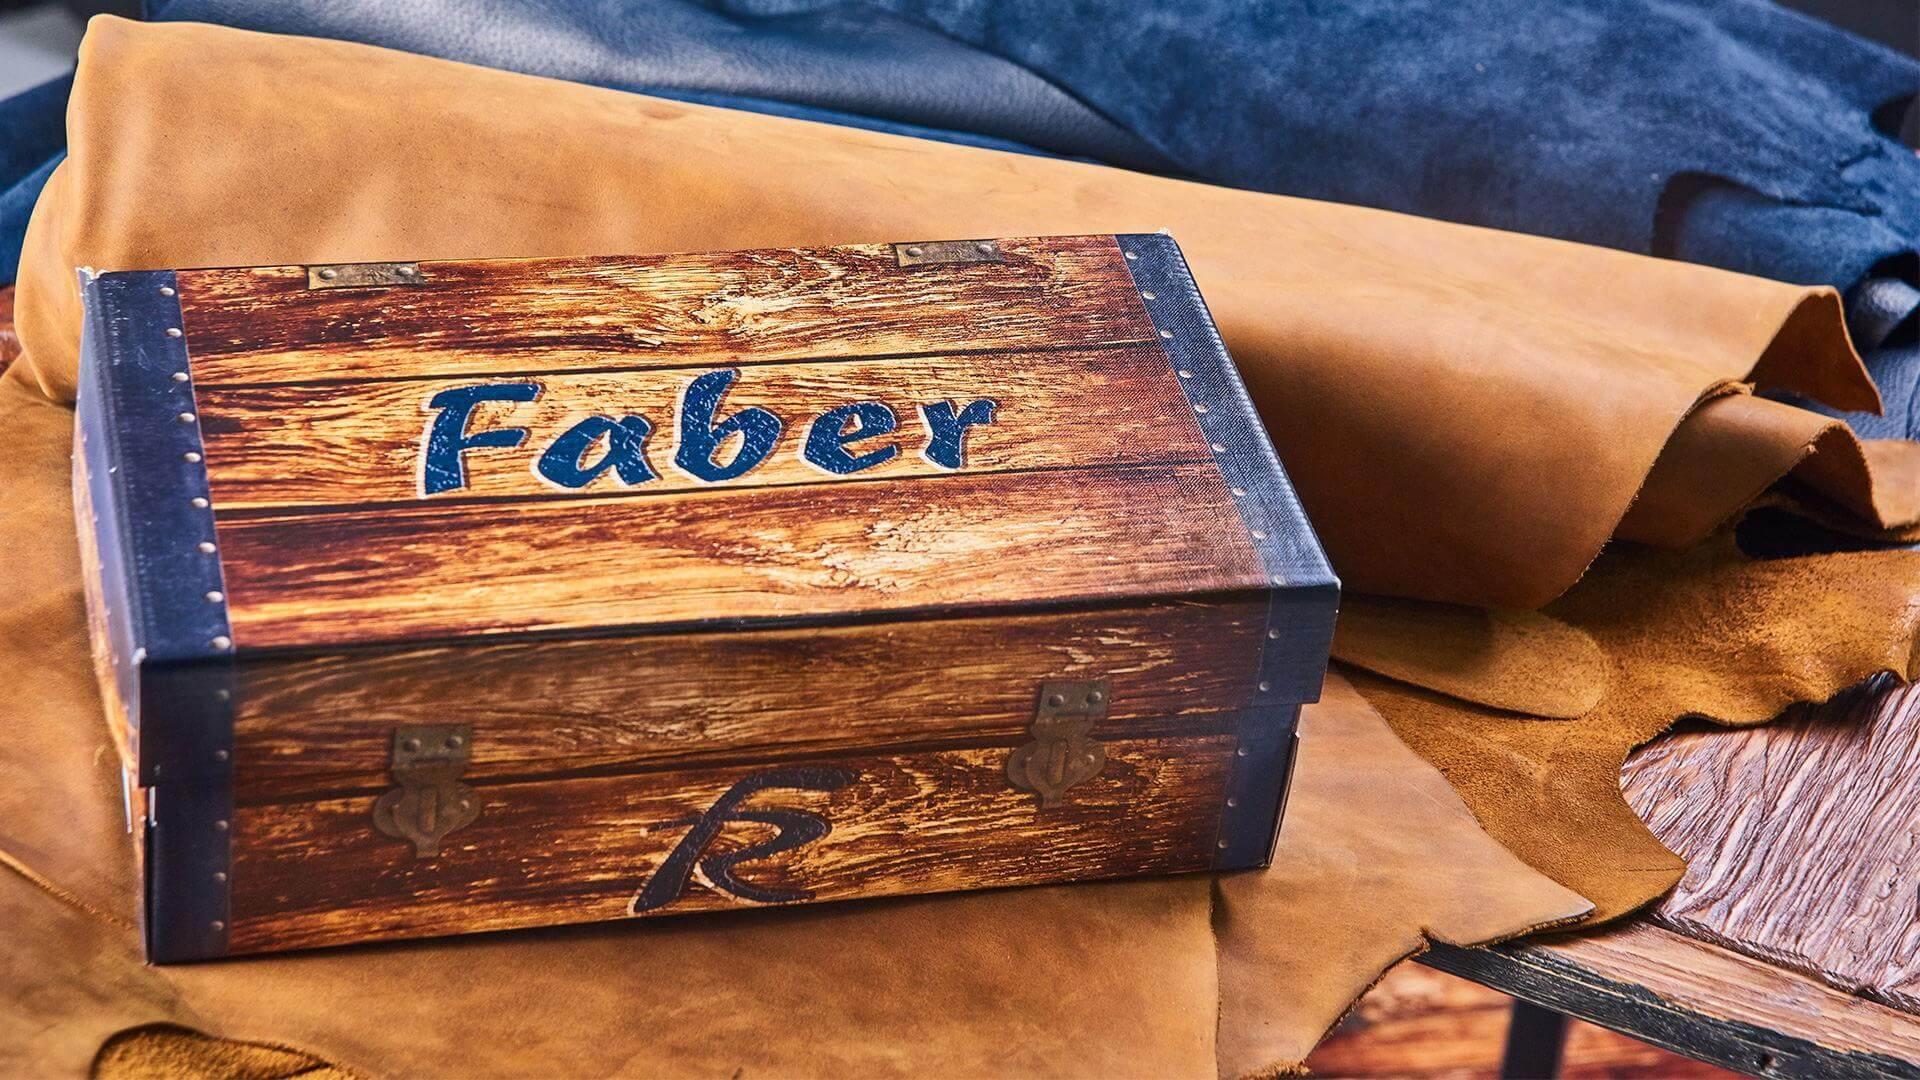 faber-home-main-slider-01